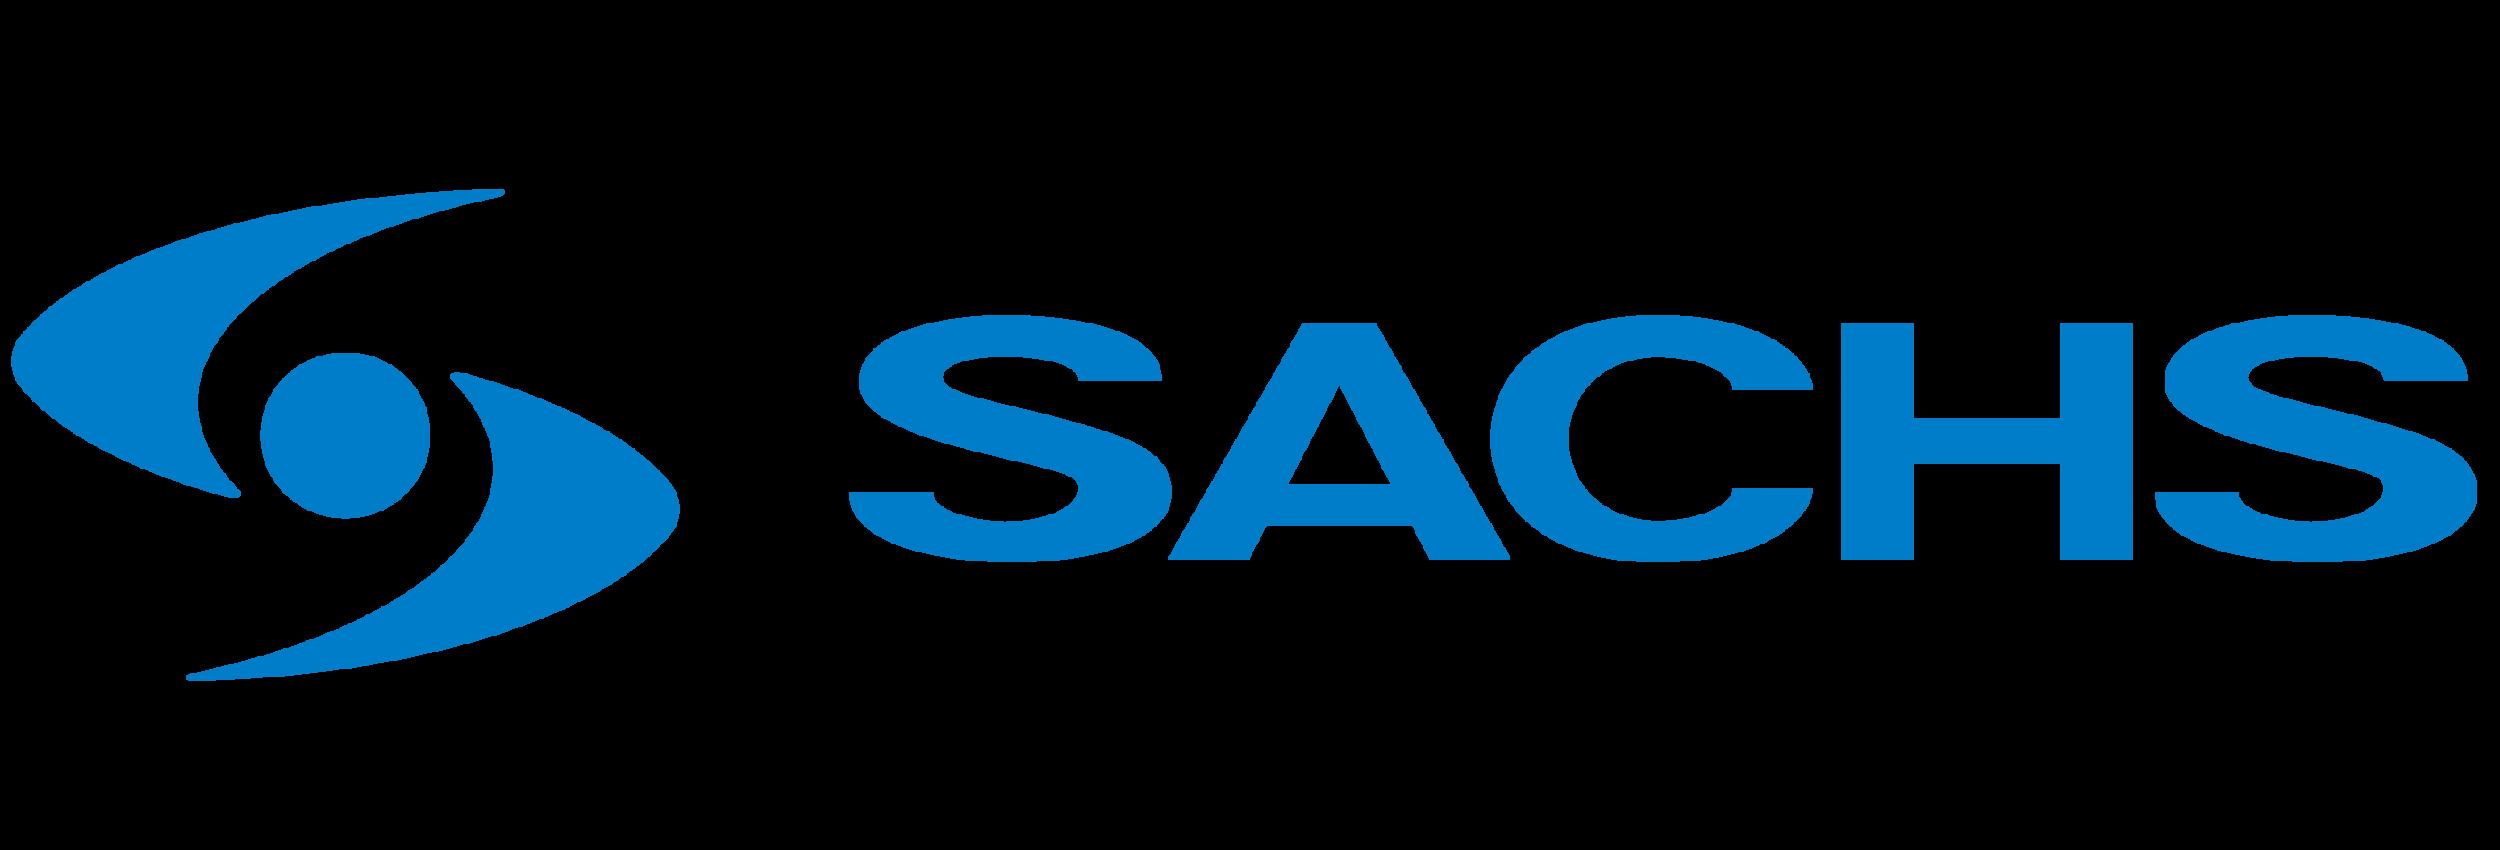 Sachs-Motorcycle-Logo.png